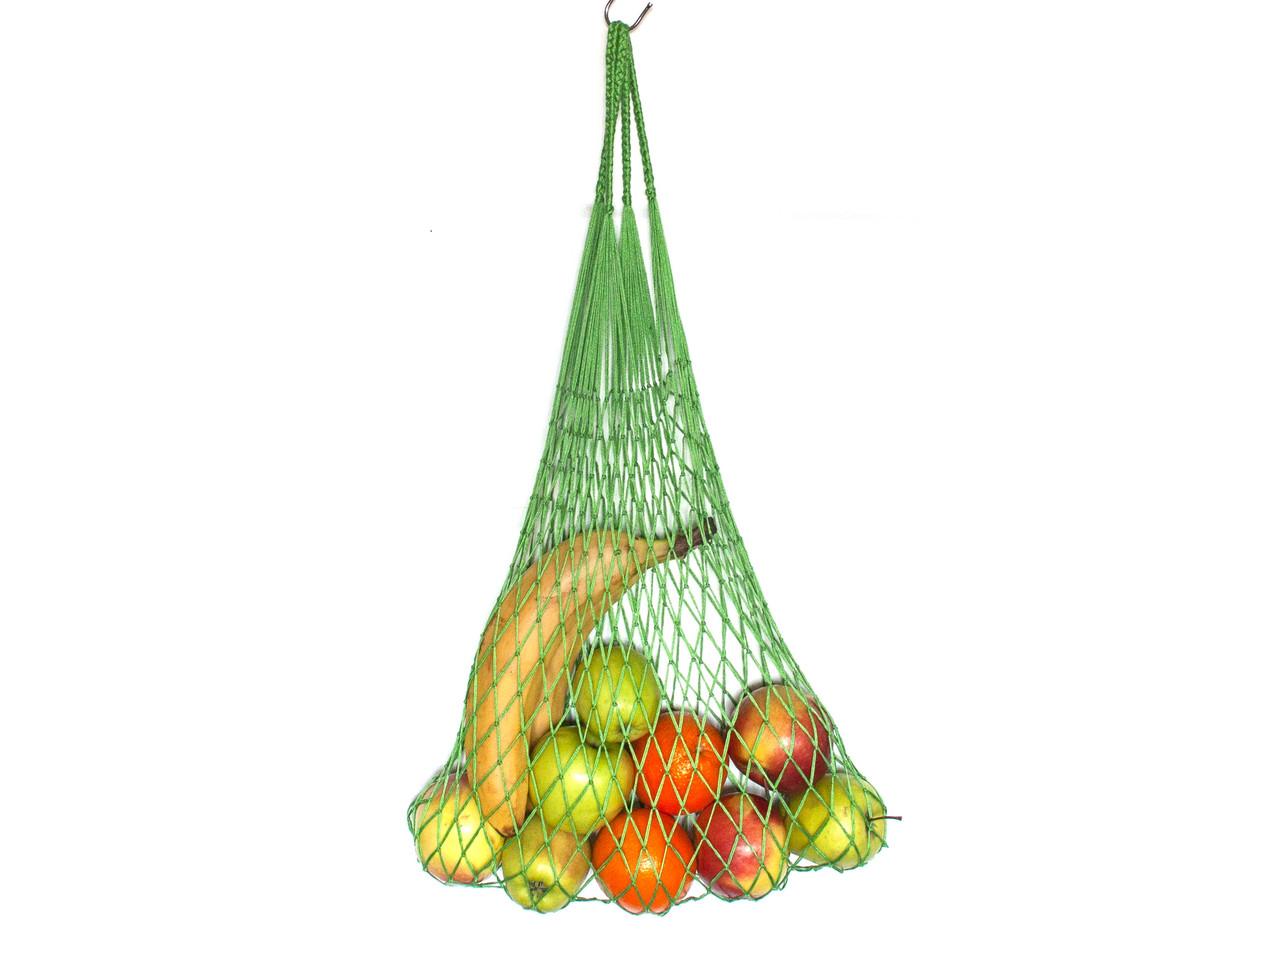 Сумка  хлопковая - Авоська - Премиум - Зеленая сумка